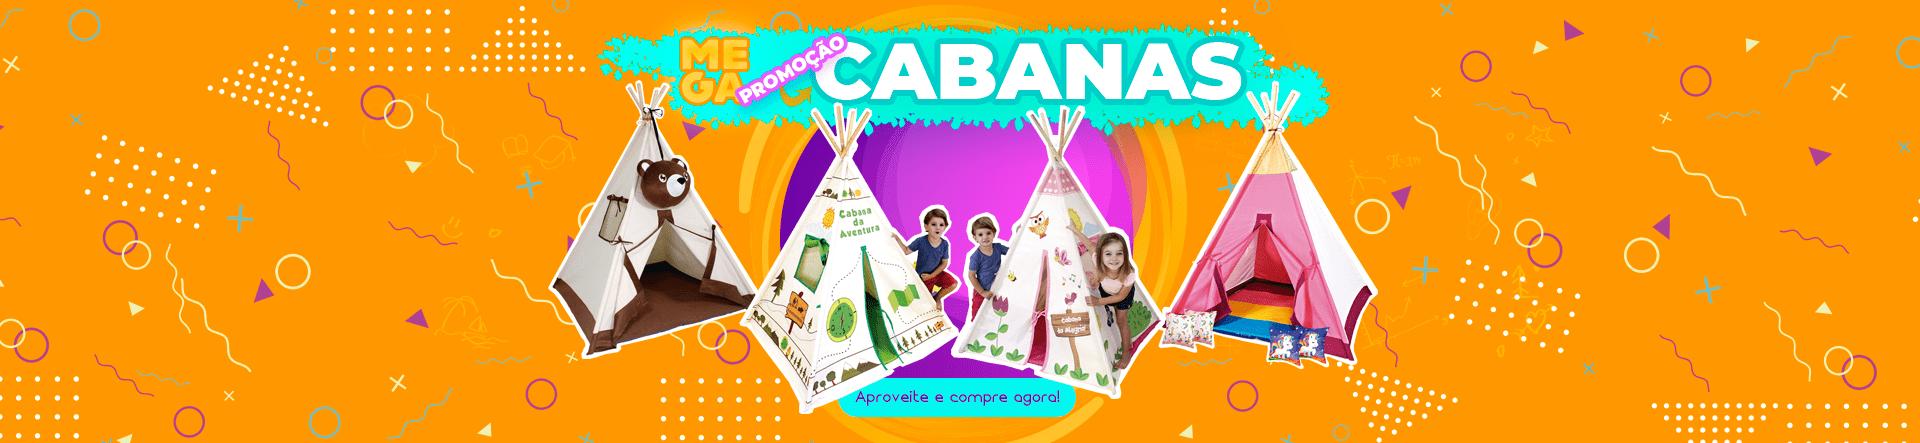 Banner Cabanas